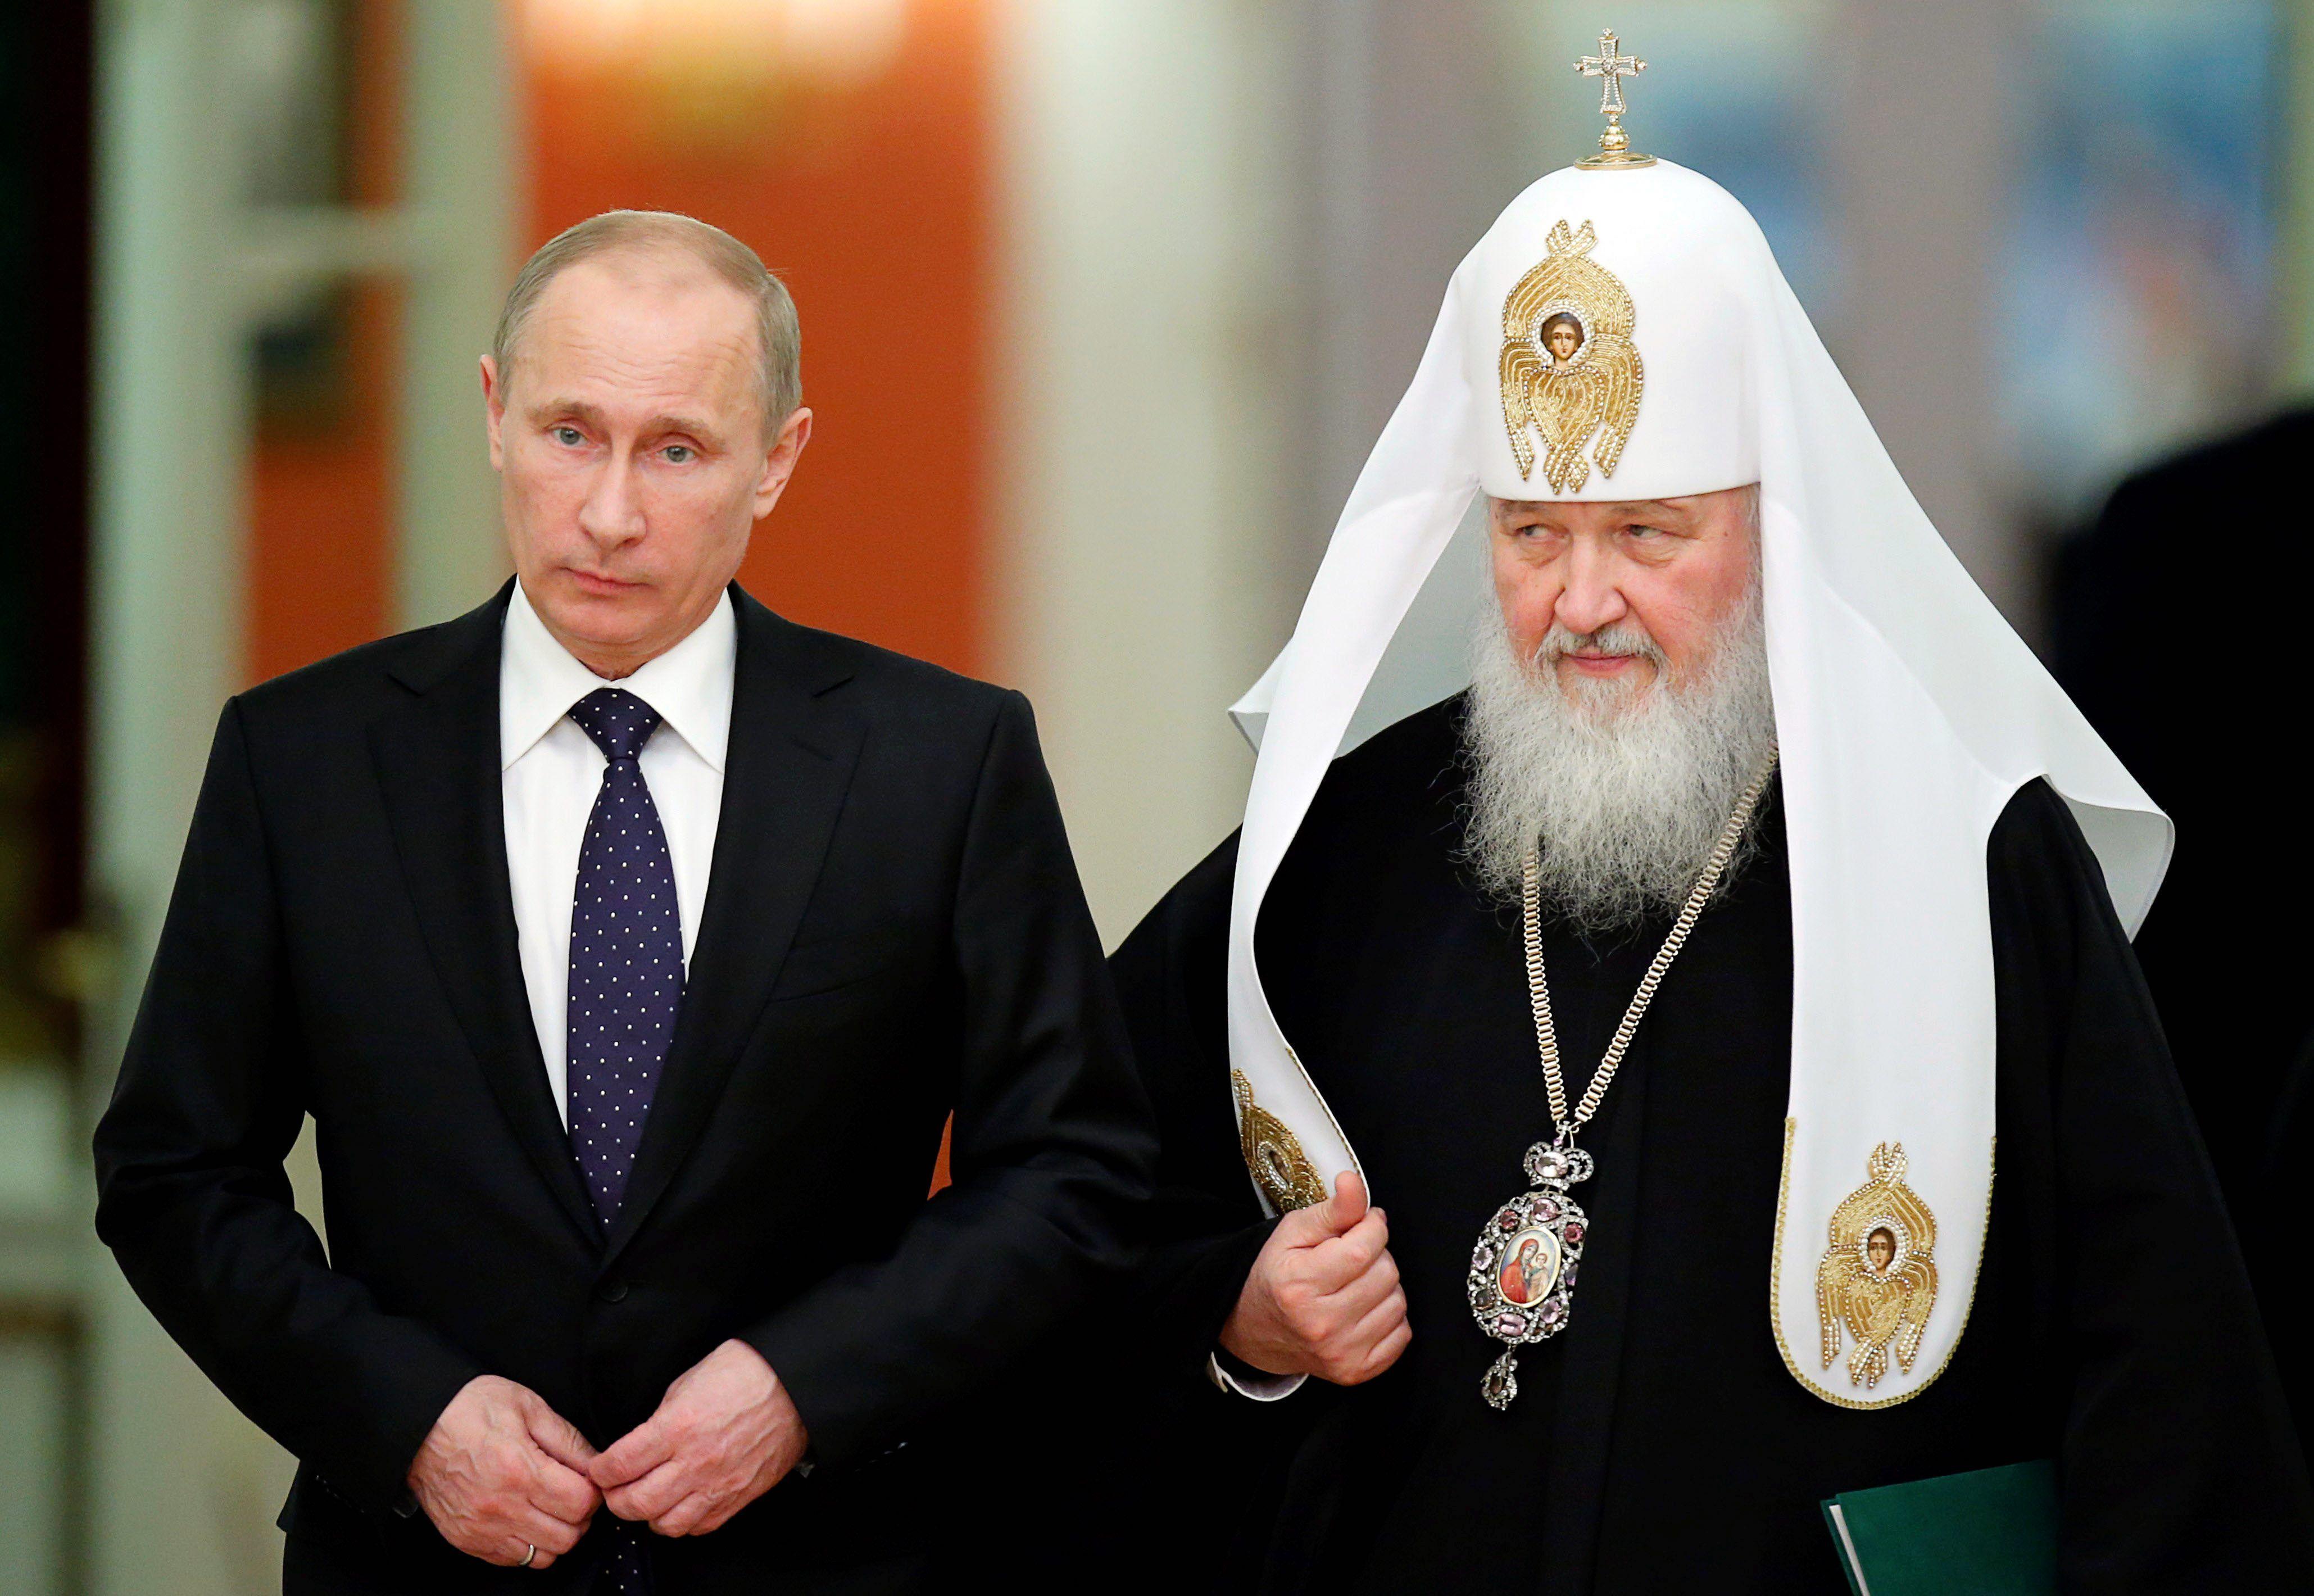 Presedintele rus, Vladimir Putin, si aliatul sau de nadejde, patriarhul rus Kirill